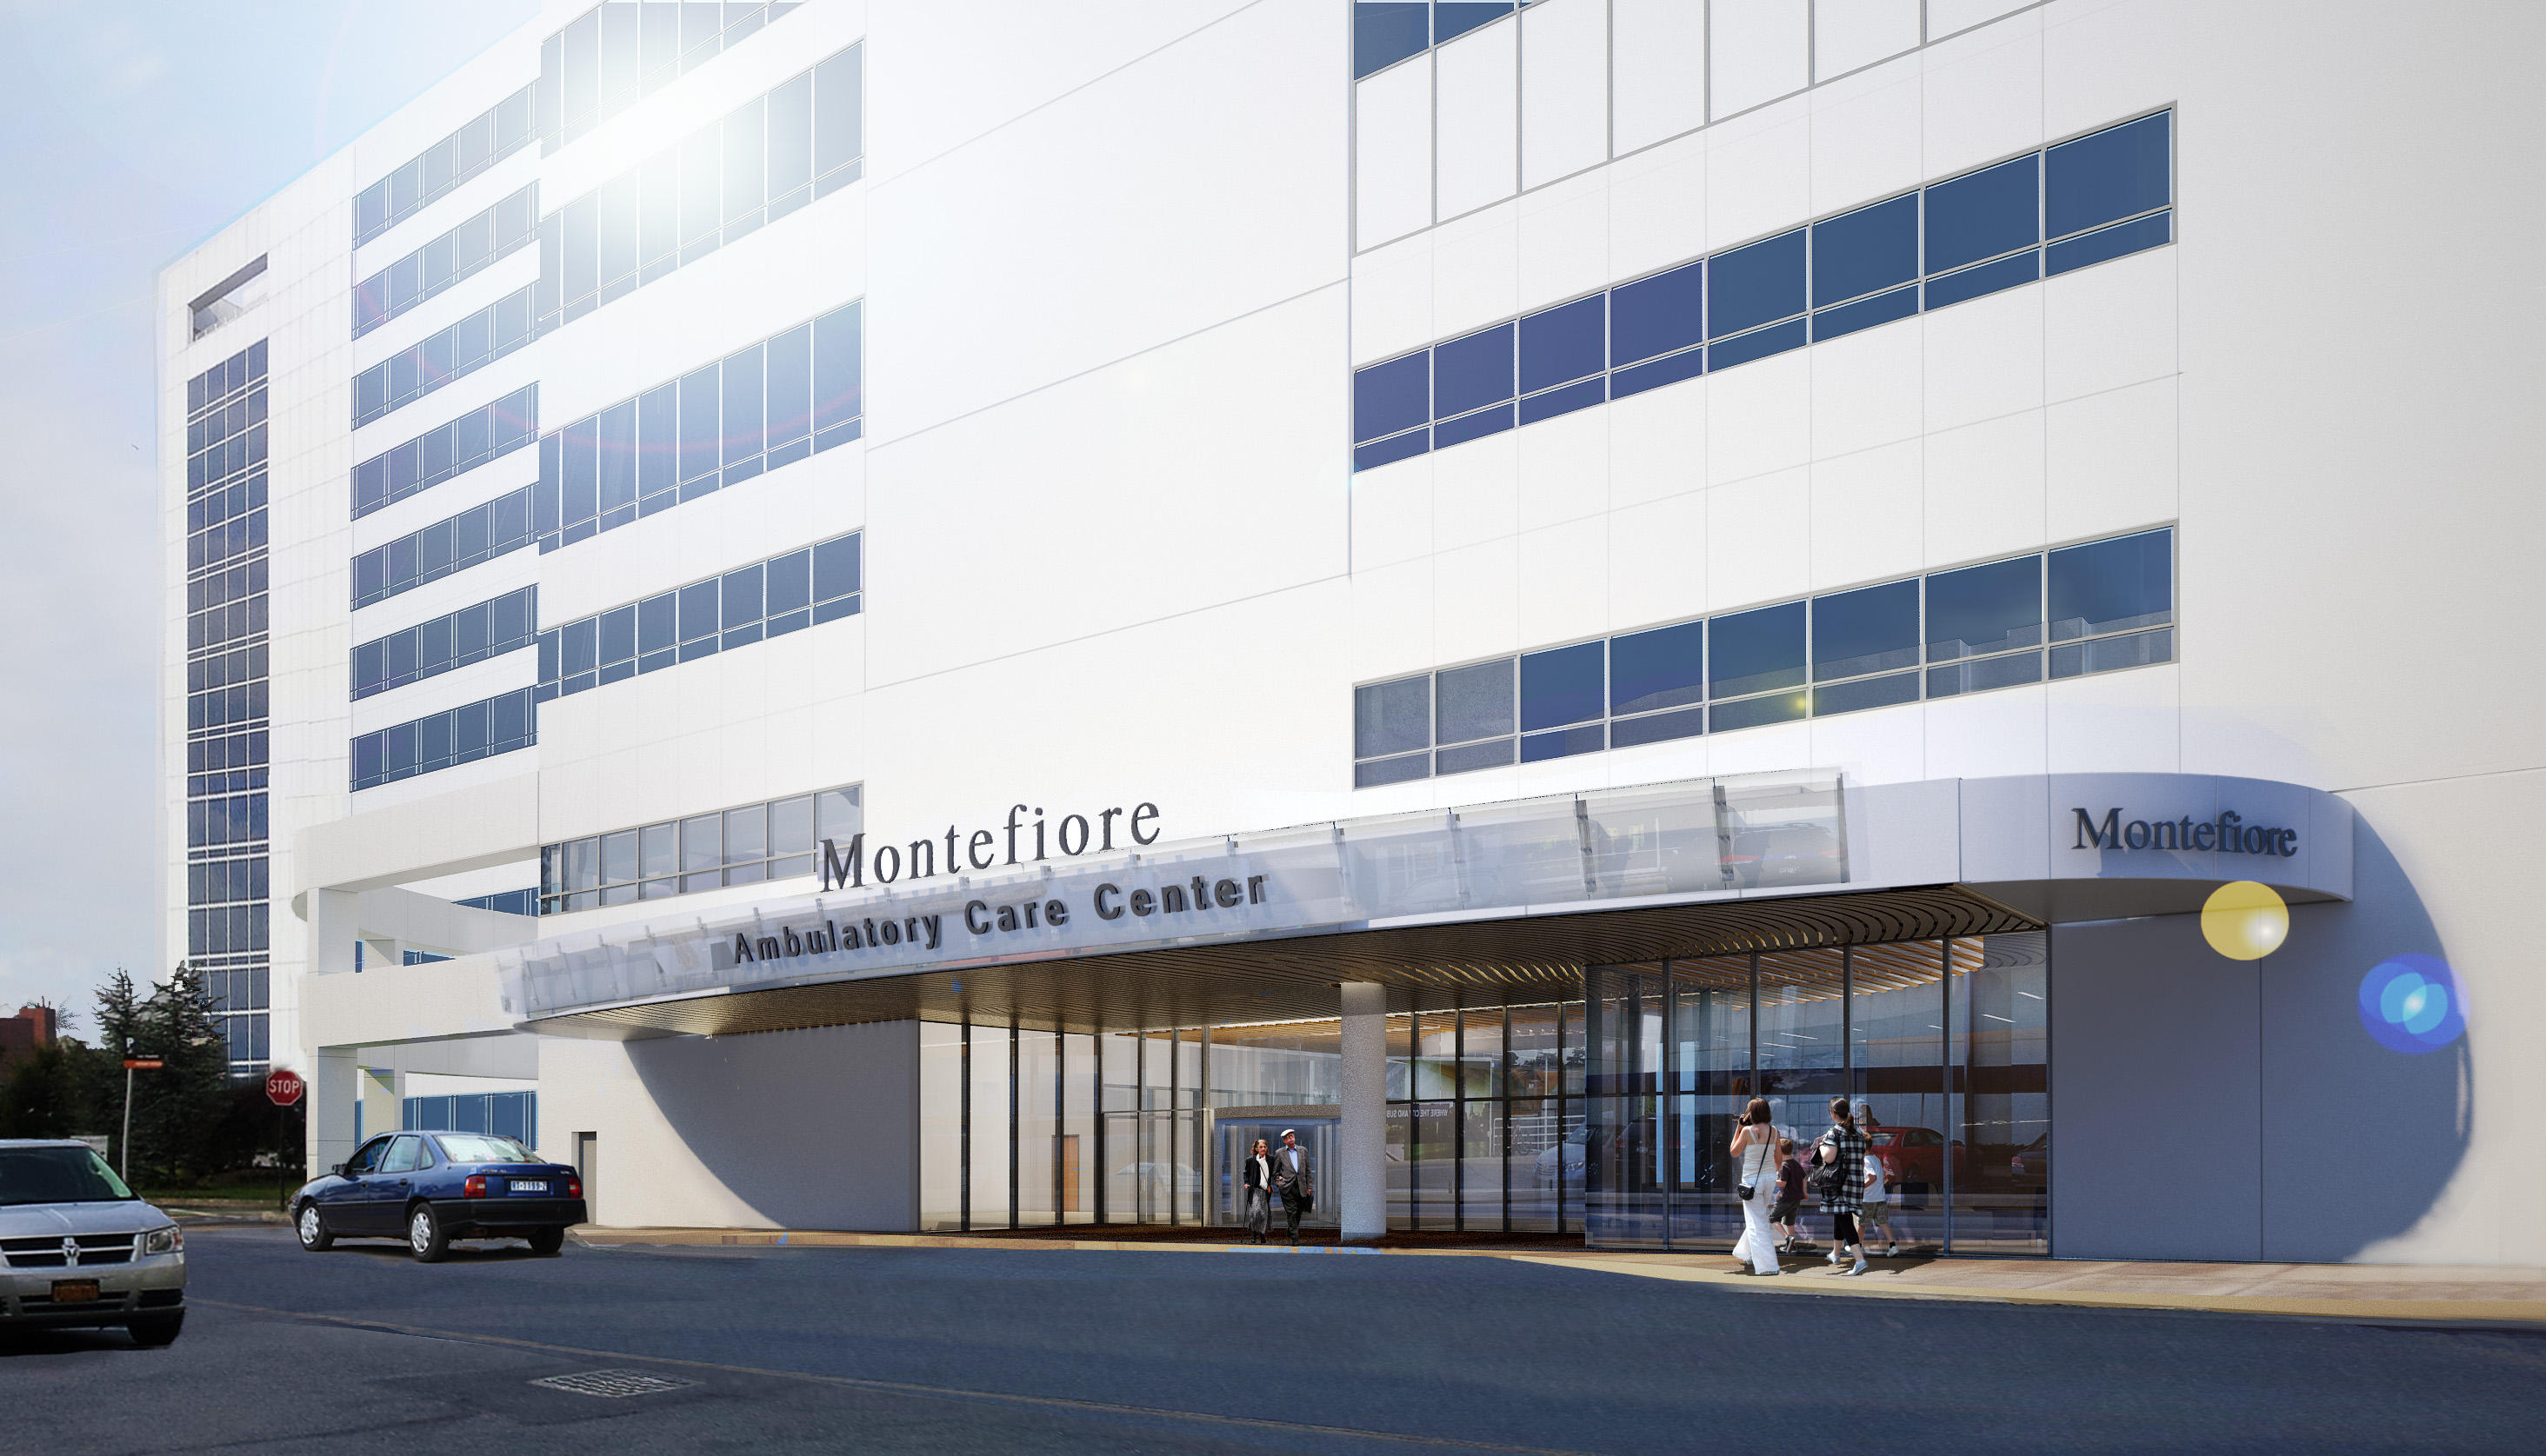 Hutch Center facade image rendering.